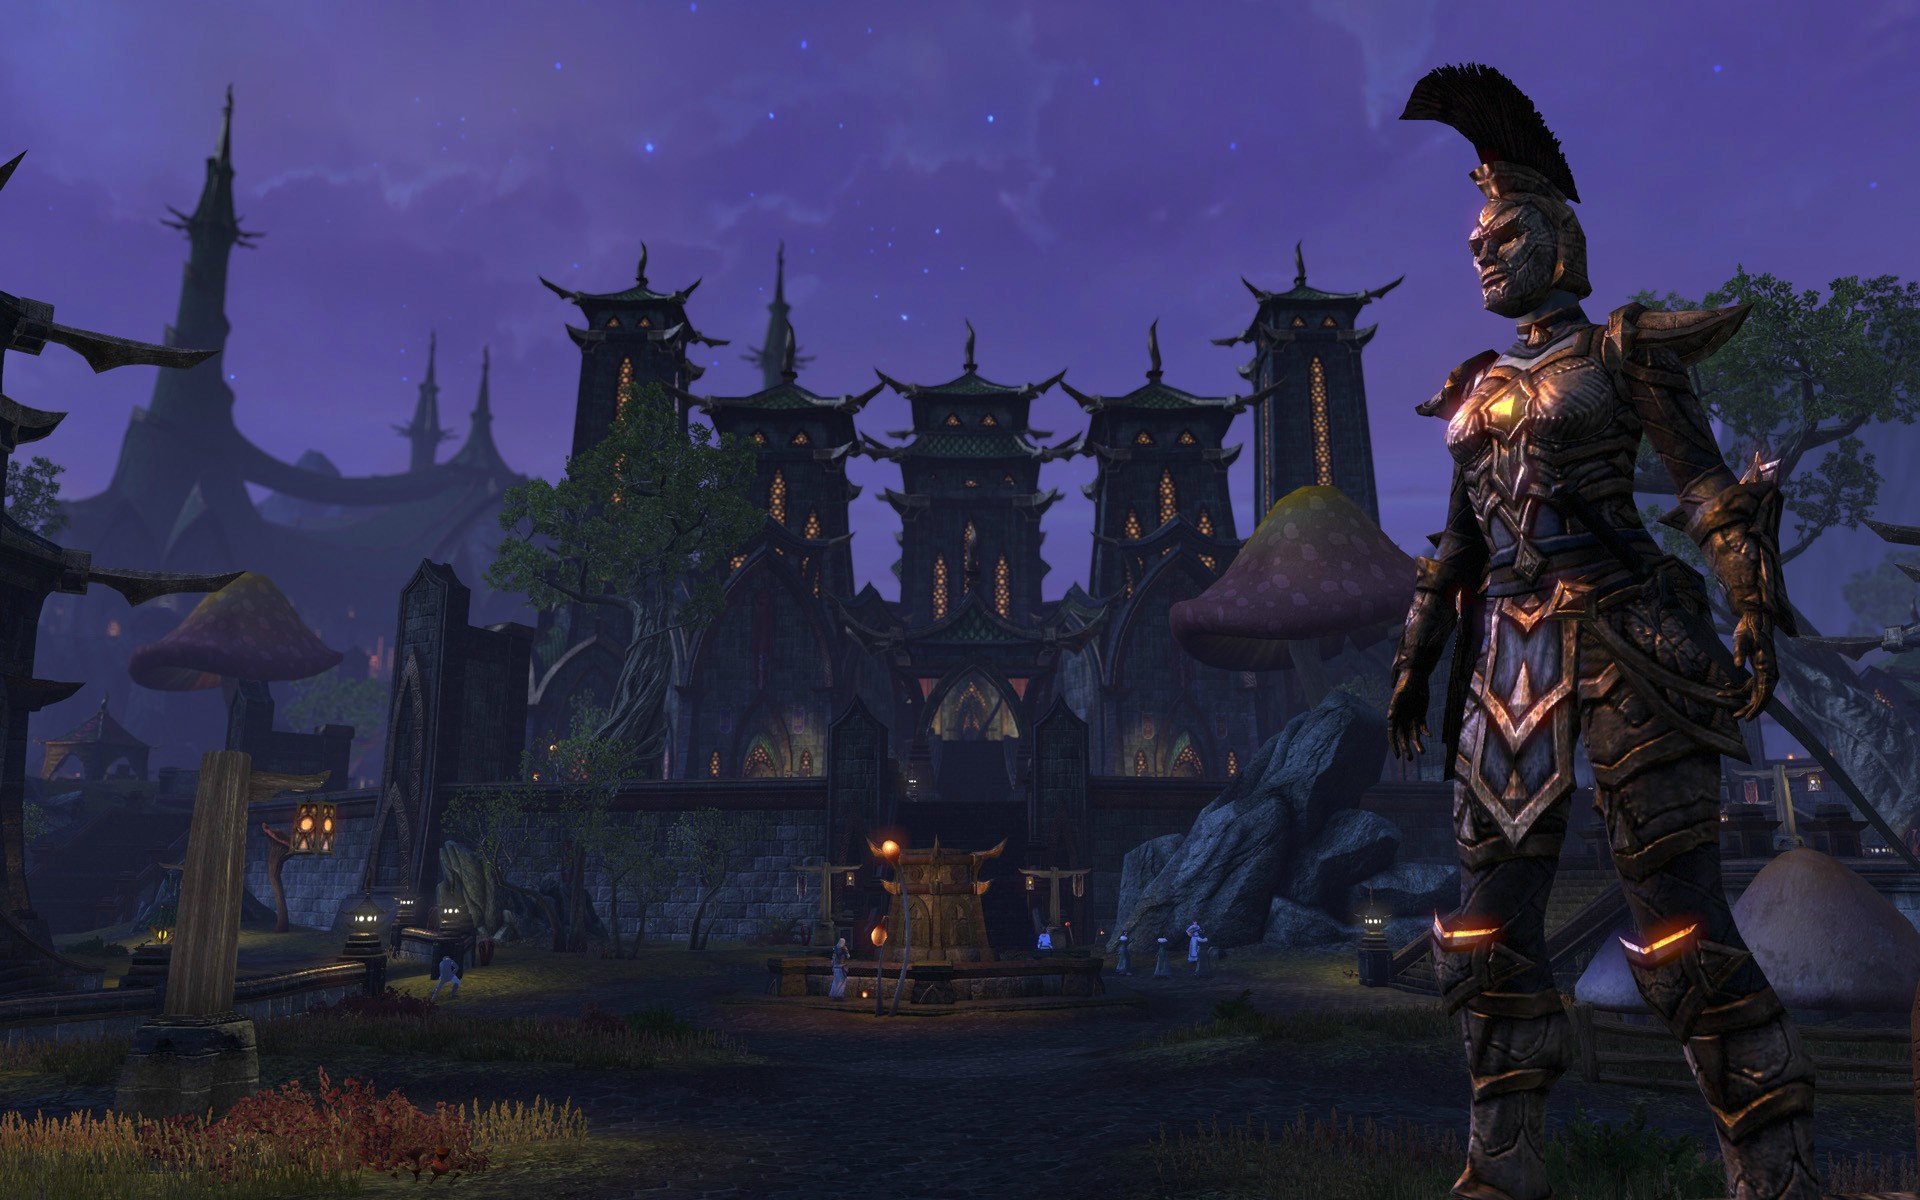 Elder scrolls online release date for xbox one